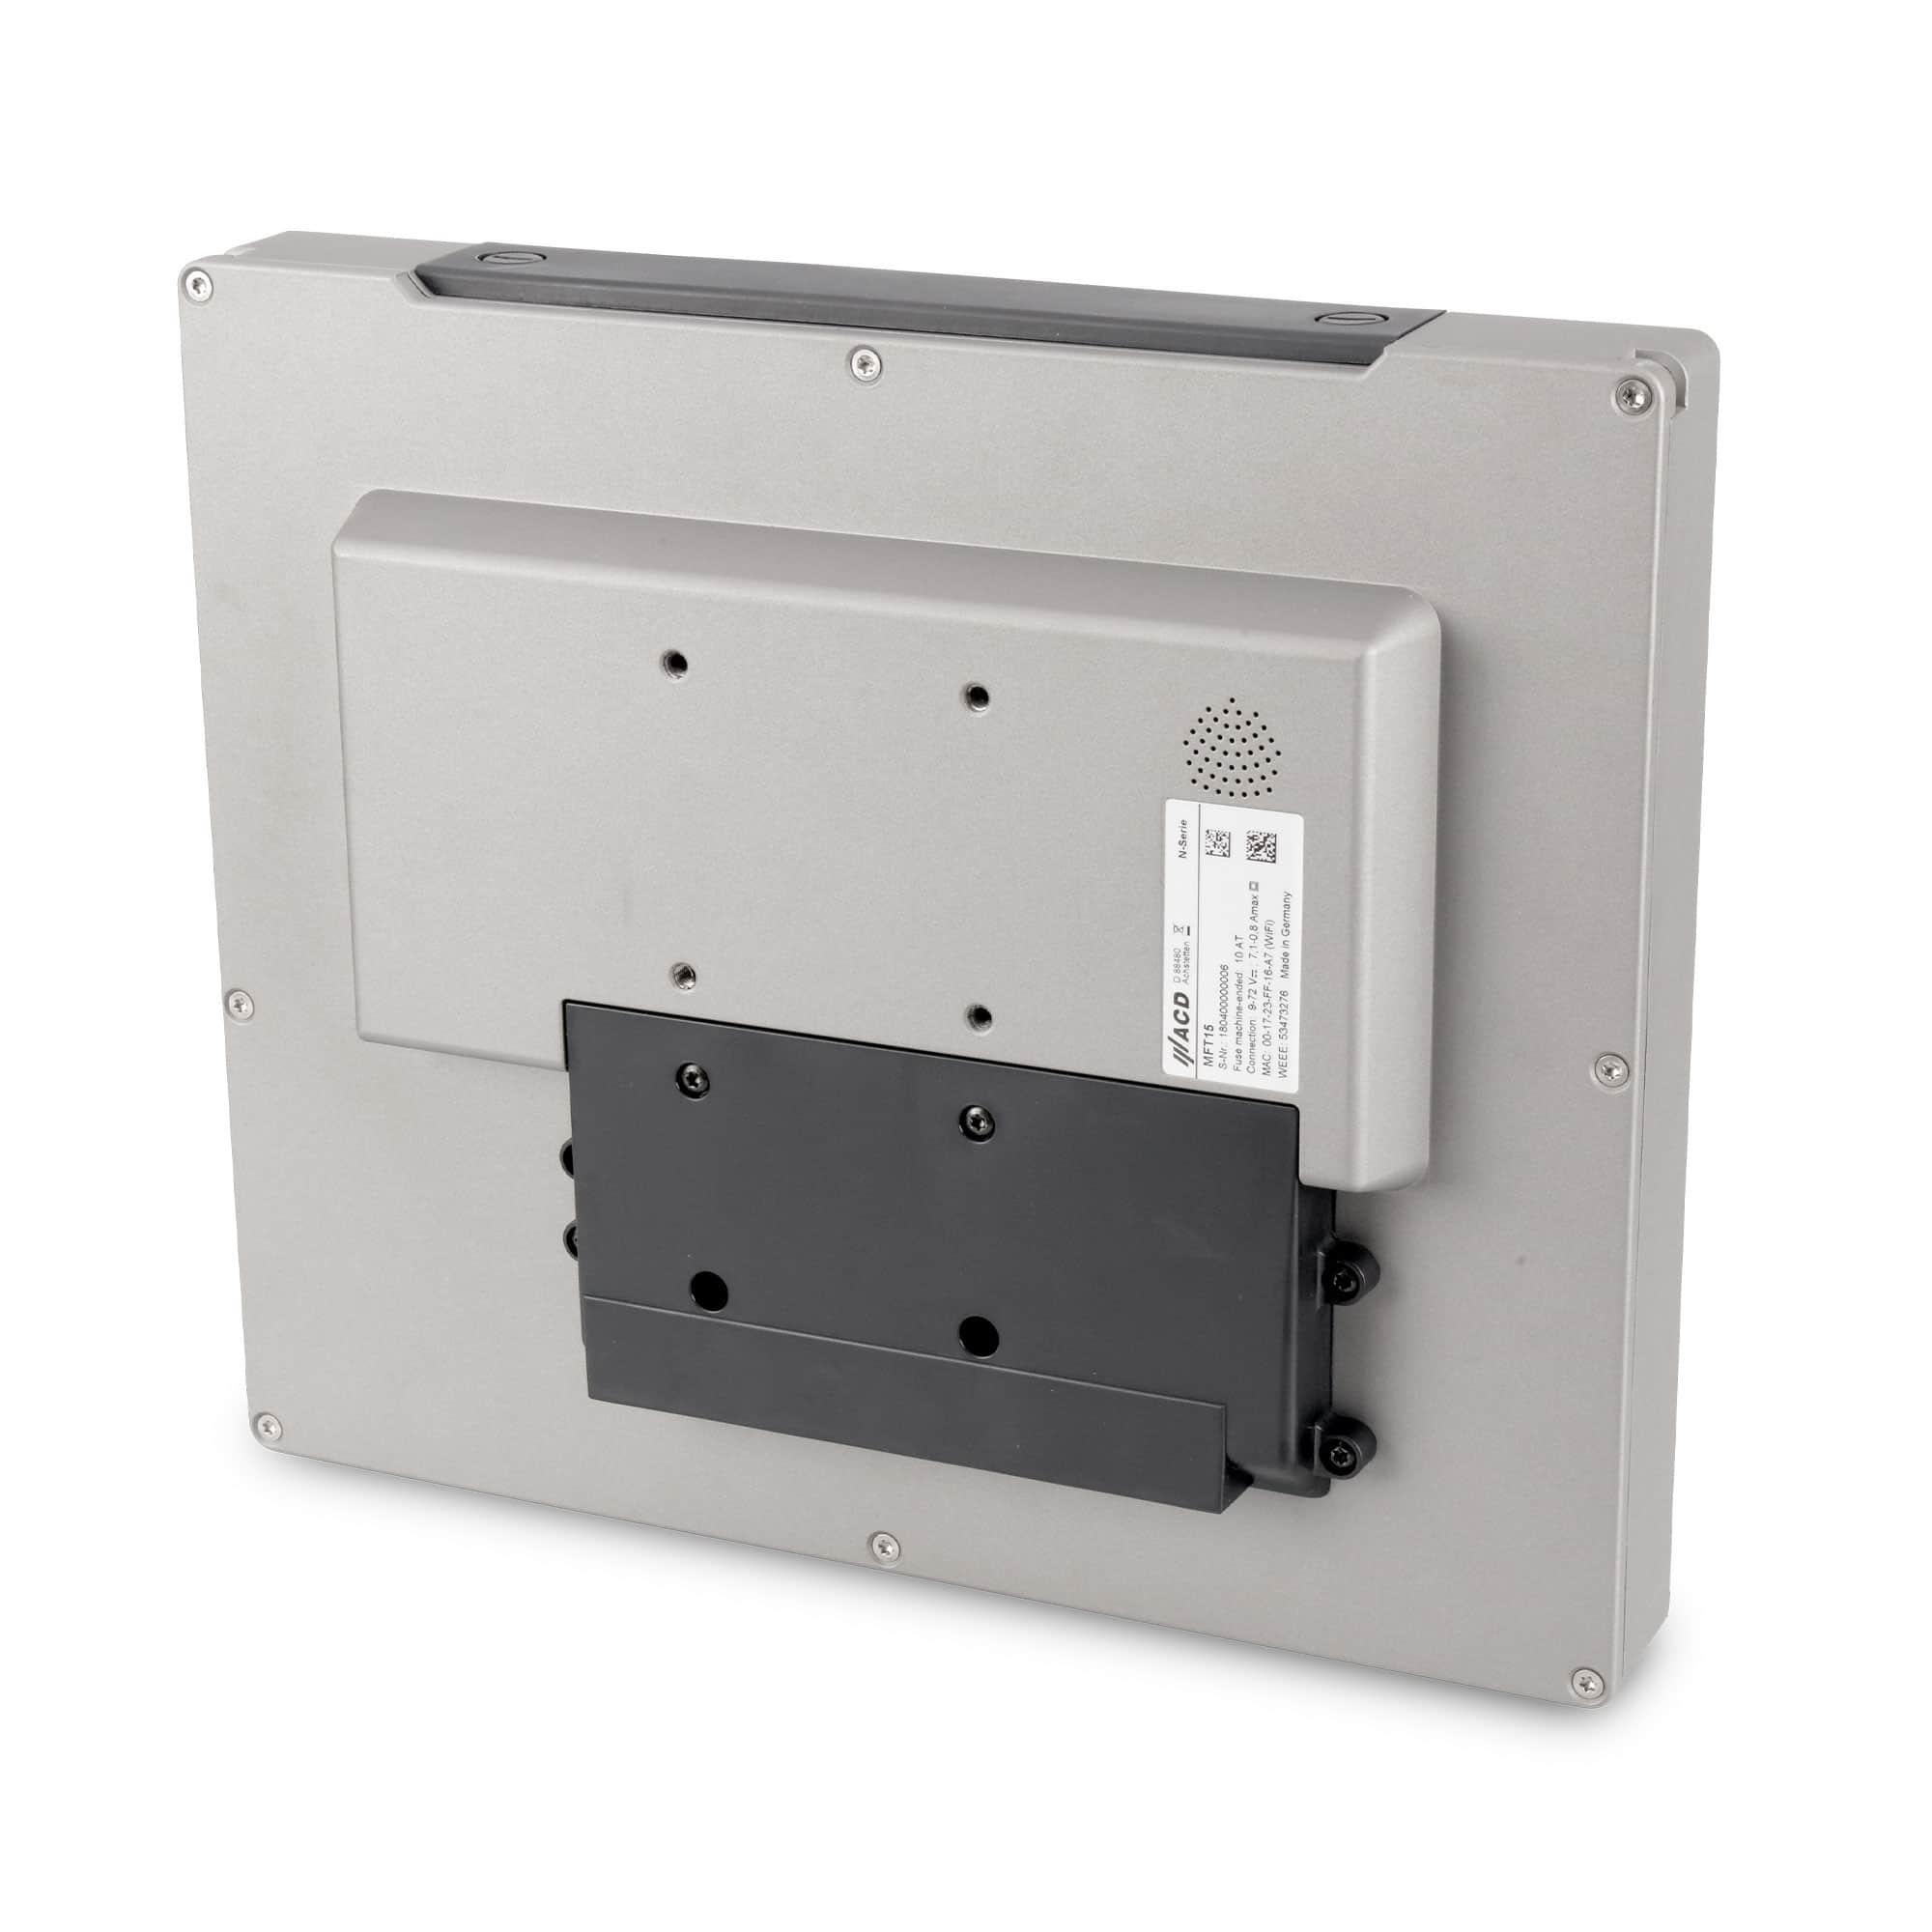 mft15-02-mobile-geraete-staplerterminals